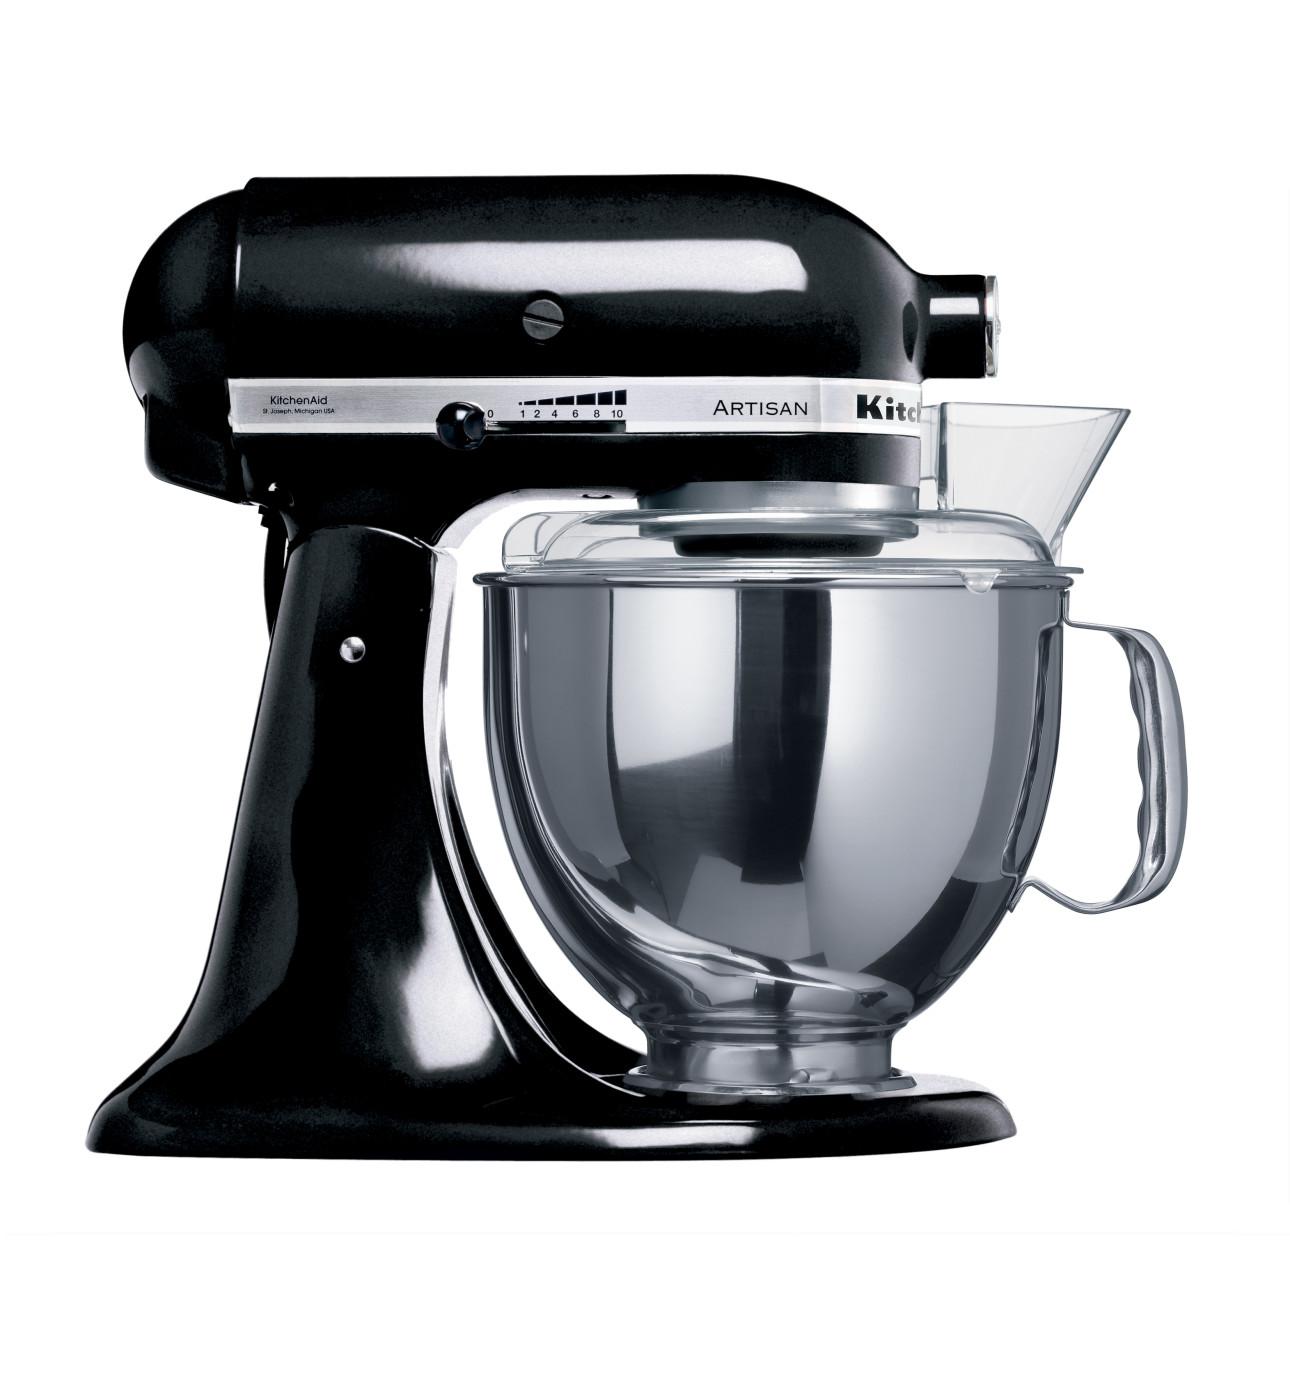 Kitchenaid | Shop Kitchenaid Appliances Online | David Jones